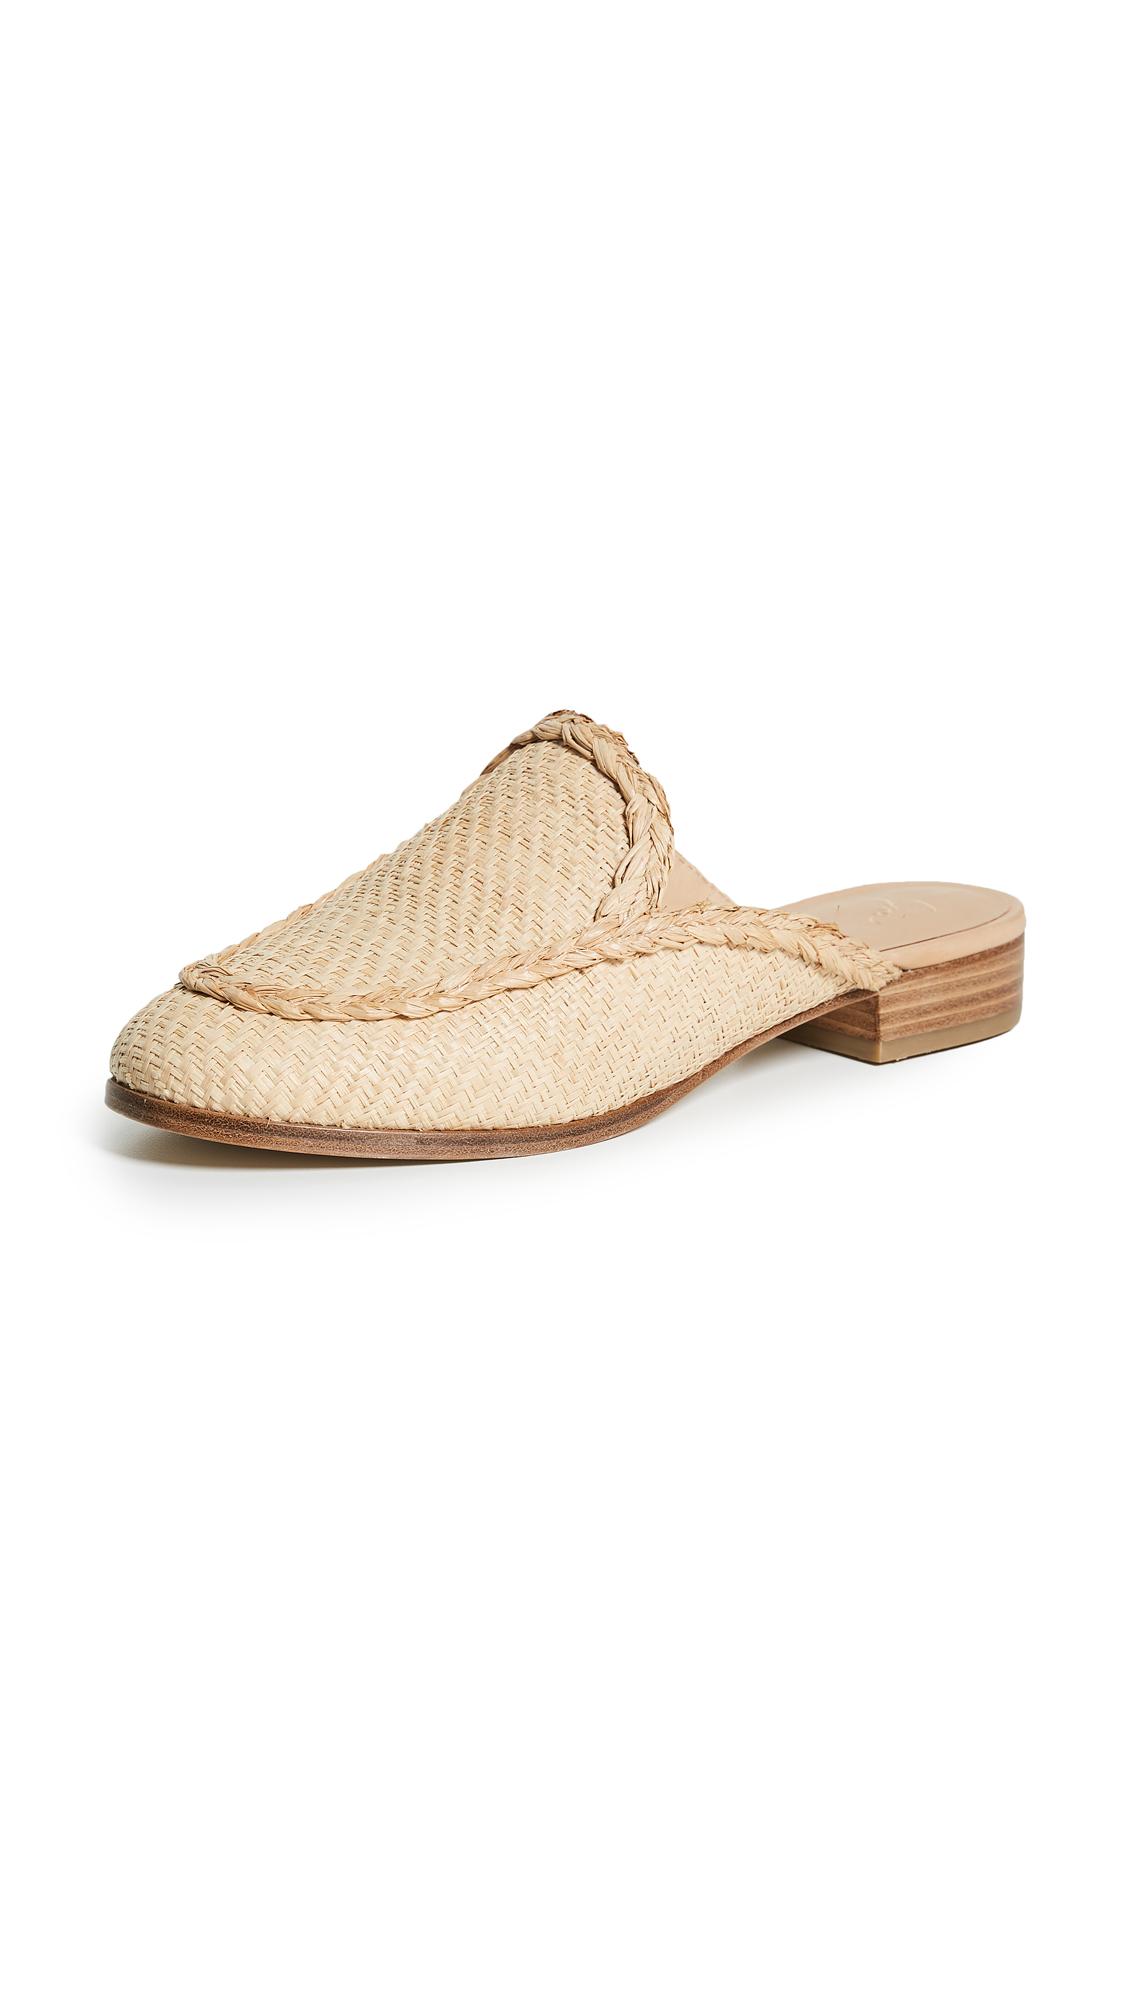 Joie Dallis Woven Mules Shoes Online Shopping At Shoe Trove